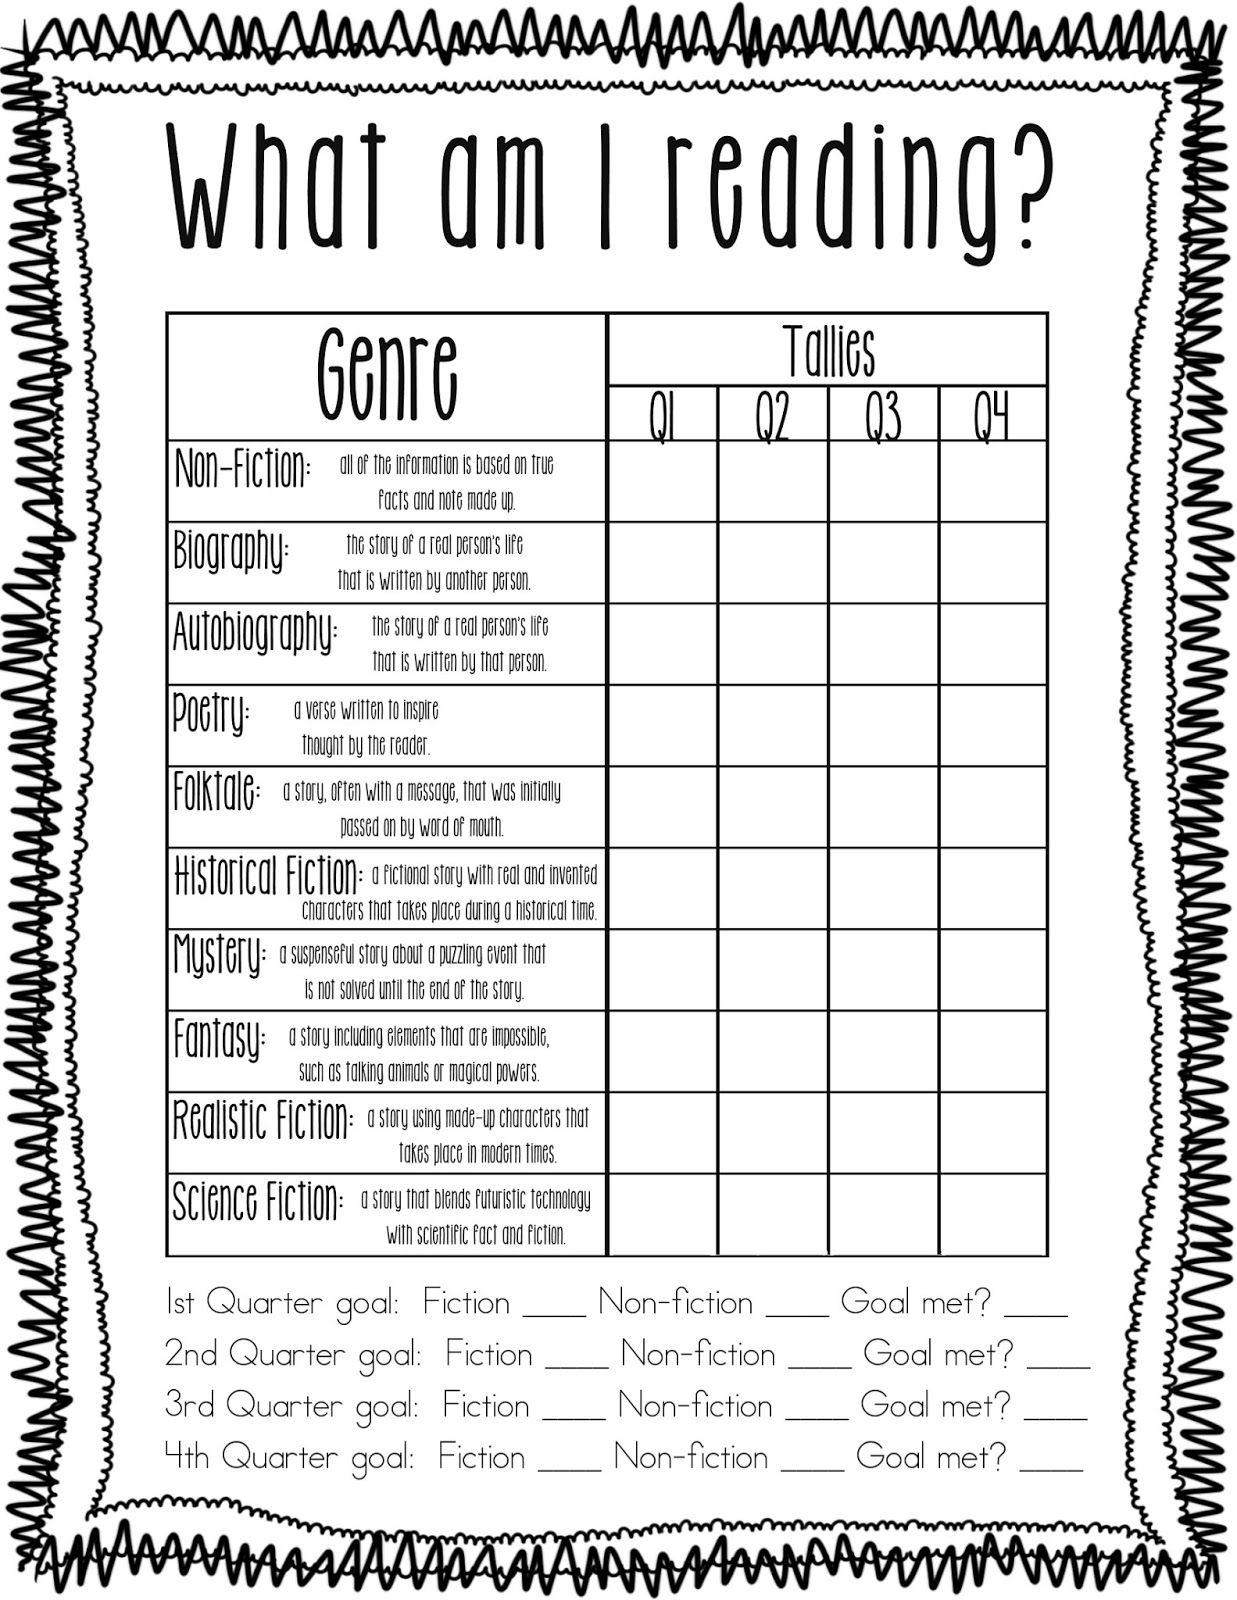 genre worksheets for 4th grade free worksheets library download and print worksheets free on. Black Bedroom Furniture Sets. Home Design Ideas